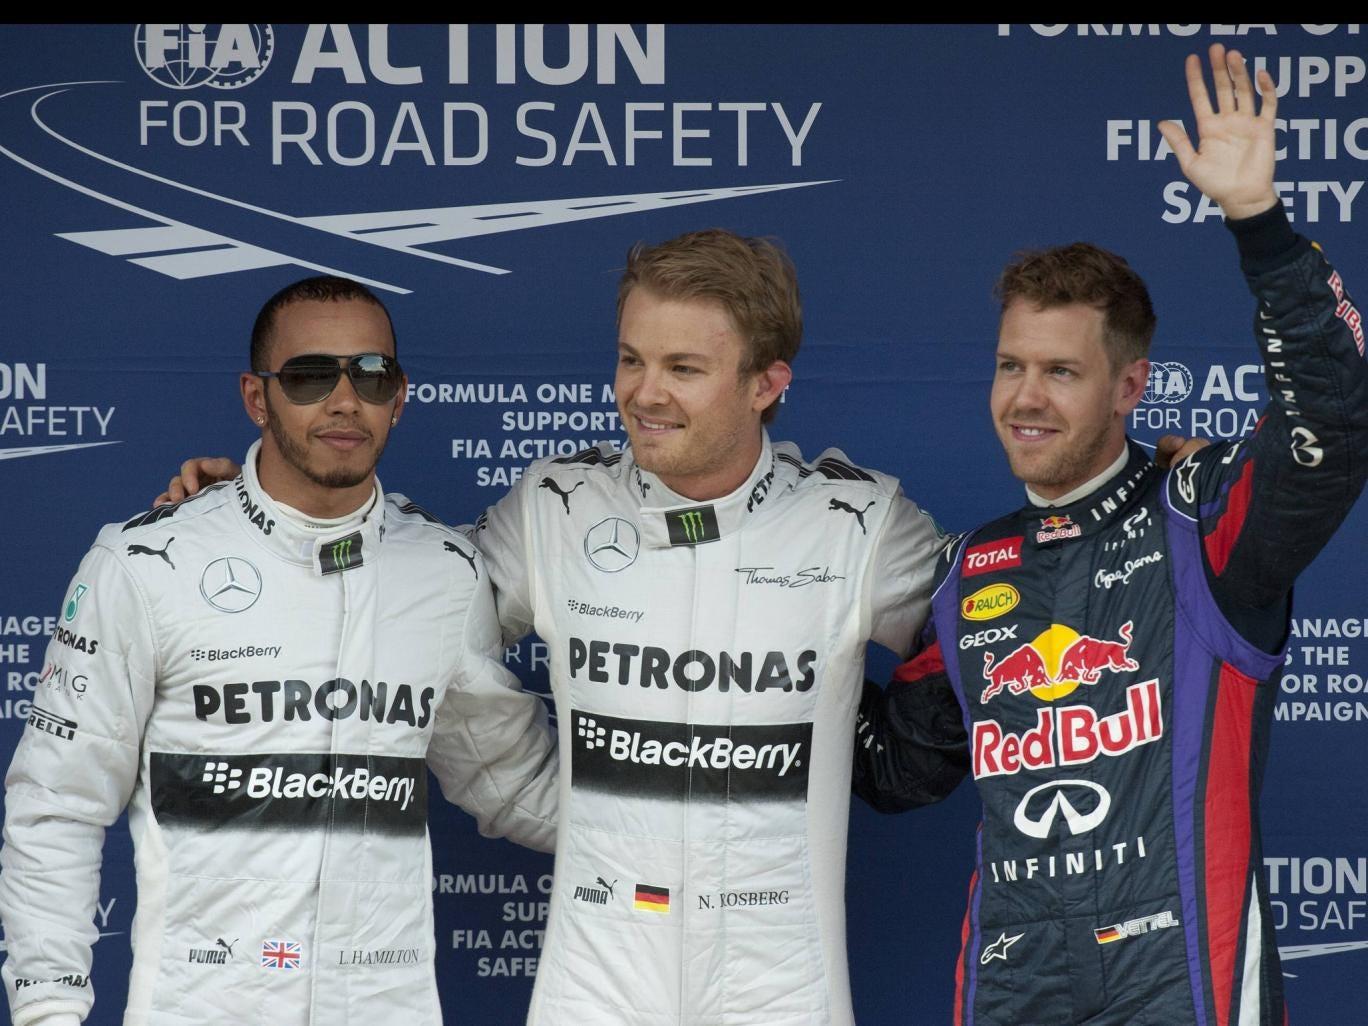 Nico Rosberg claims pole ahead of Lewis Hamilton and Sebastian Vettel for the Spanish GP